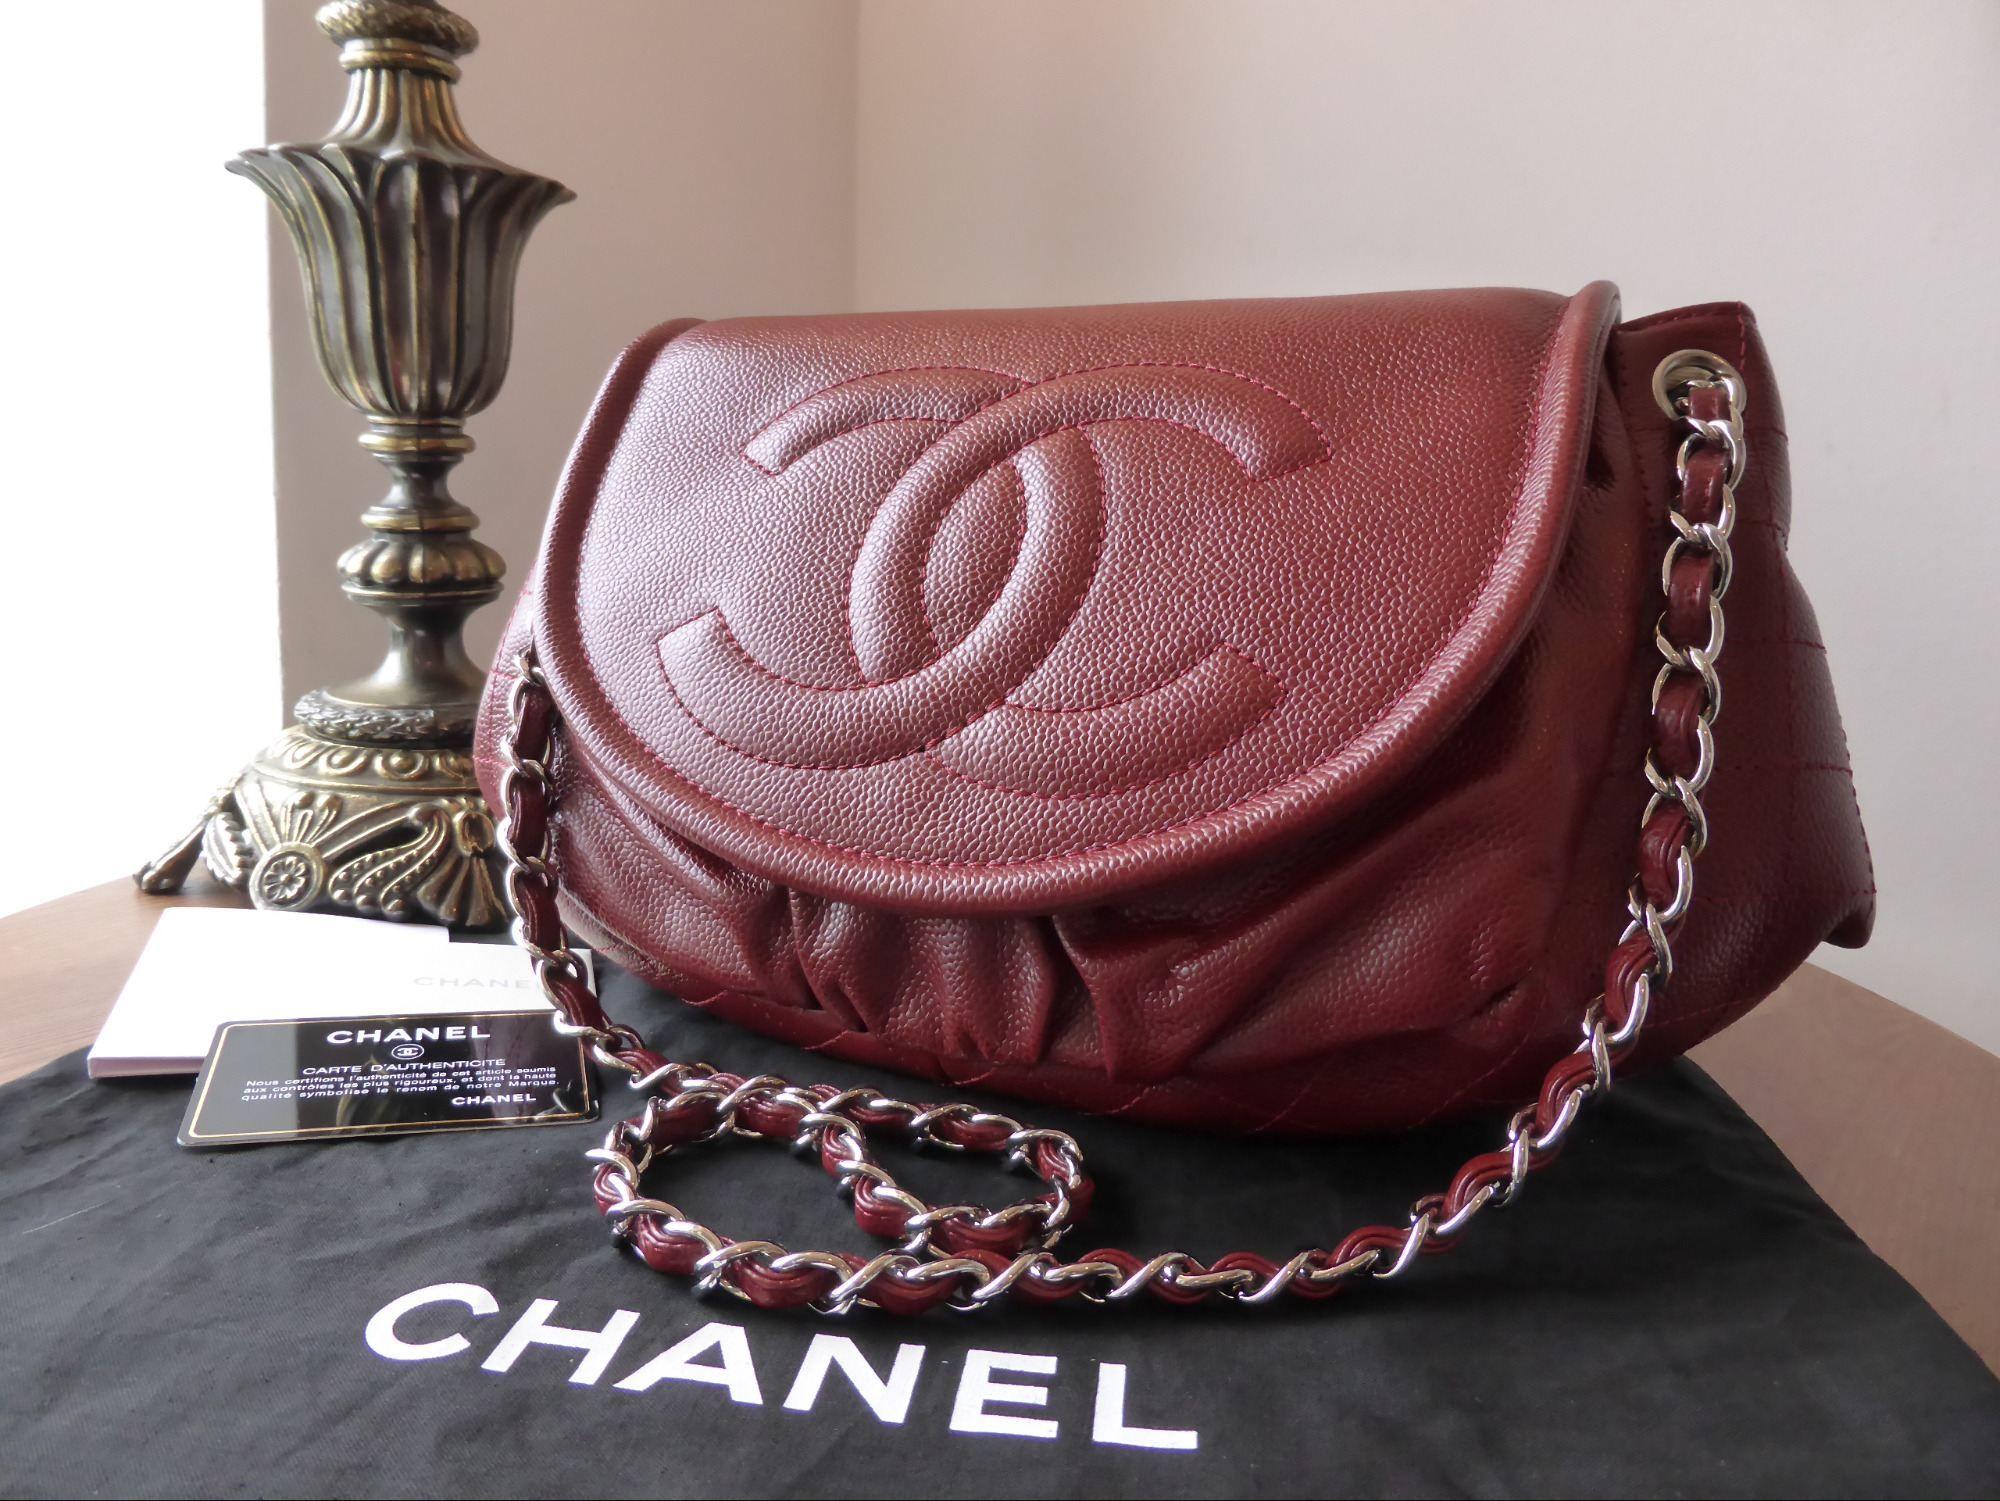 8bf1f9bd5433 Chanel Half Moon Jumbo XL Timeless Flap in Dark Red Caviar > http:/